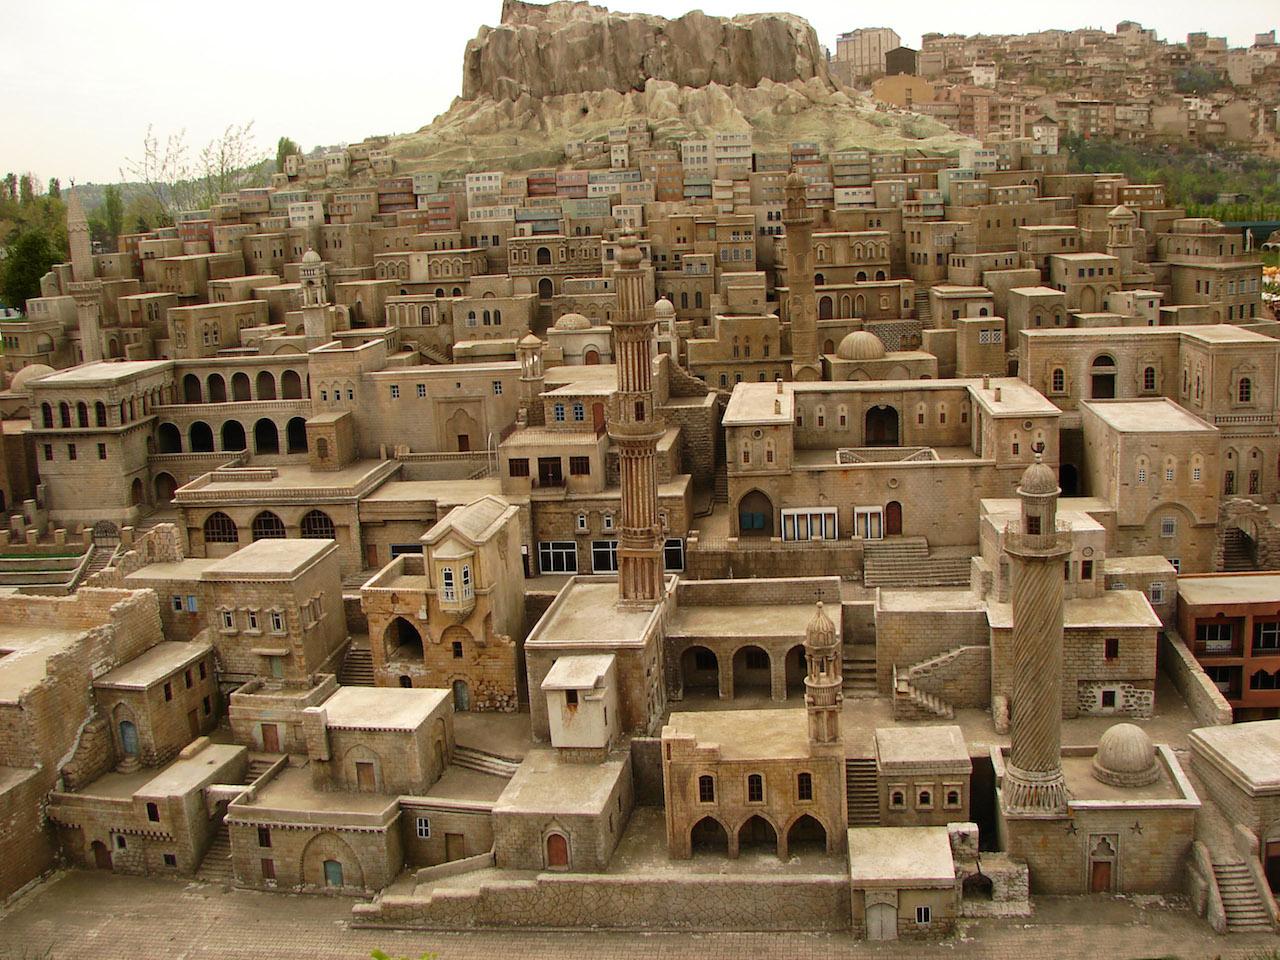 Mardin_stone_houses_02148